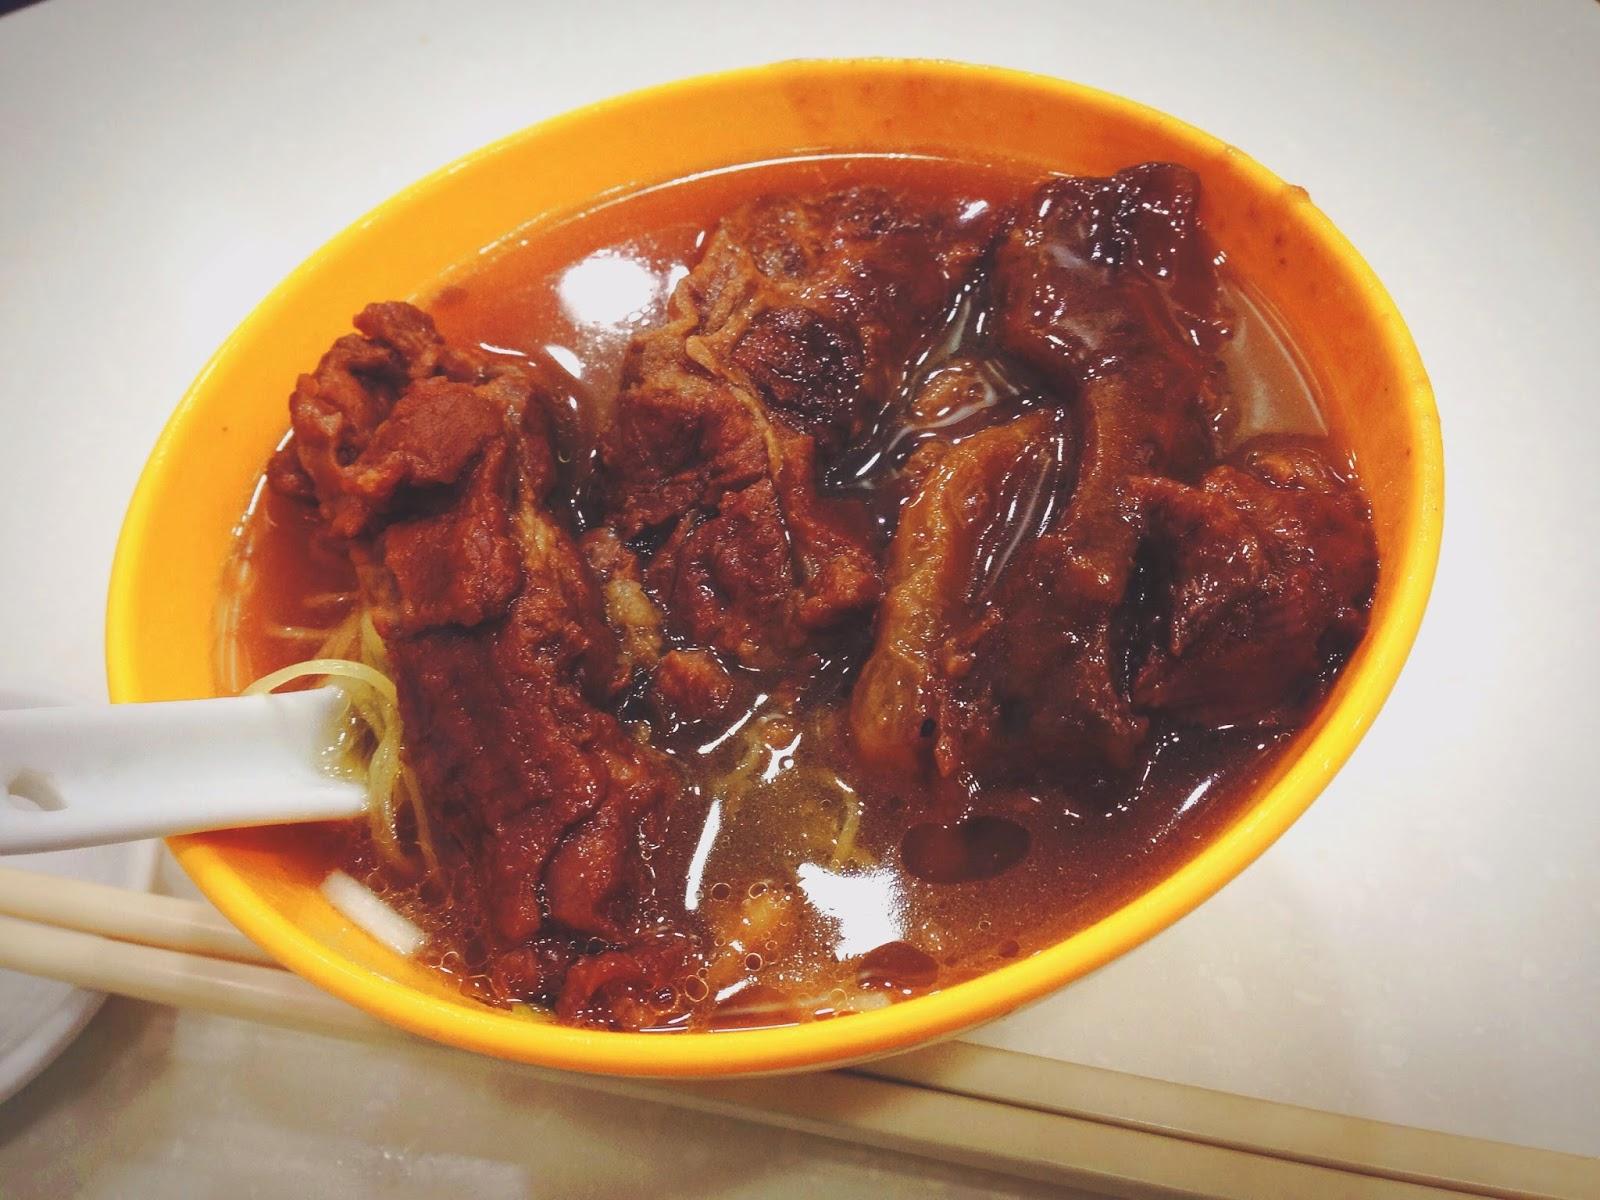 Mak Man Kee Noodle Shop Beef Brisket Noodles Parkes St, Jordan, Hong Kong